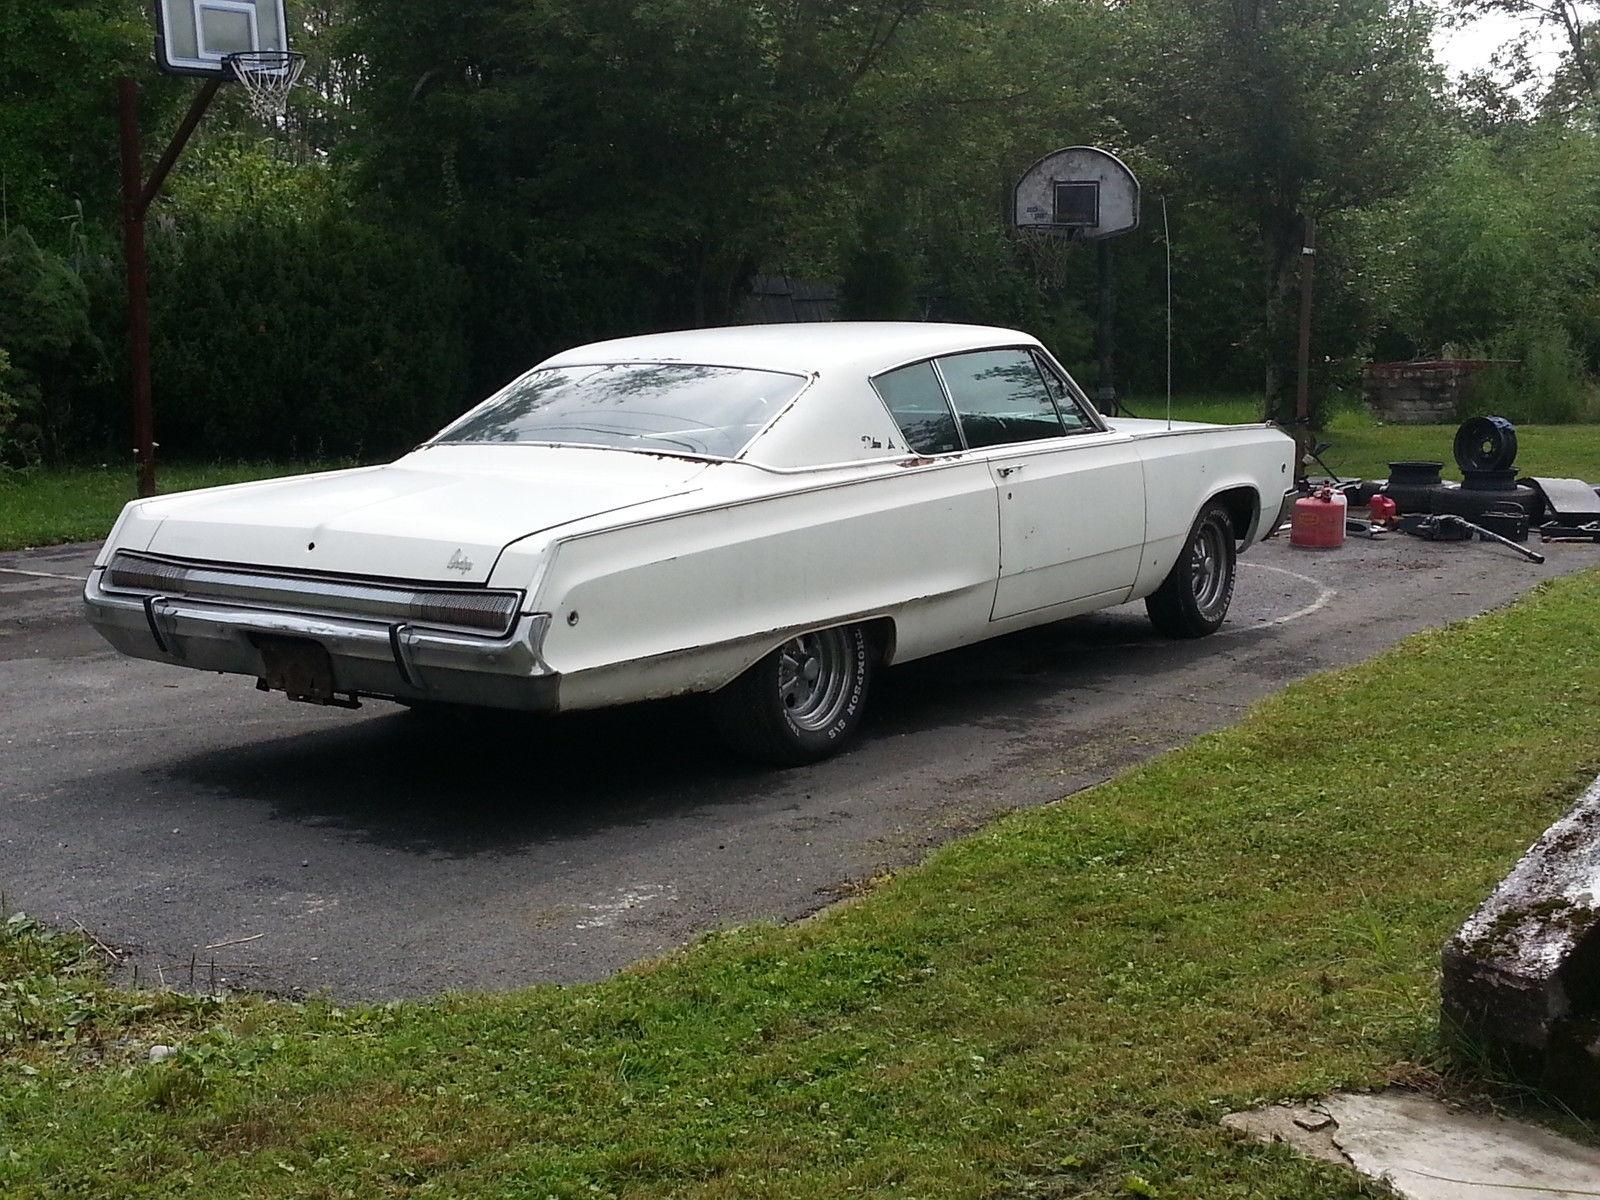 Full Size Mopar: 1968 Dodge Polara